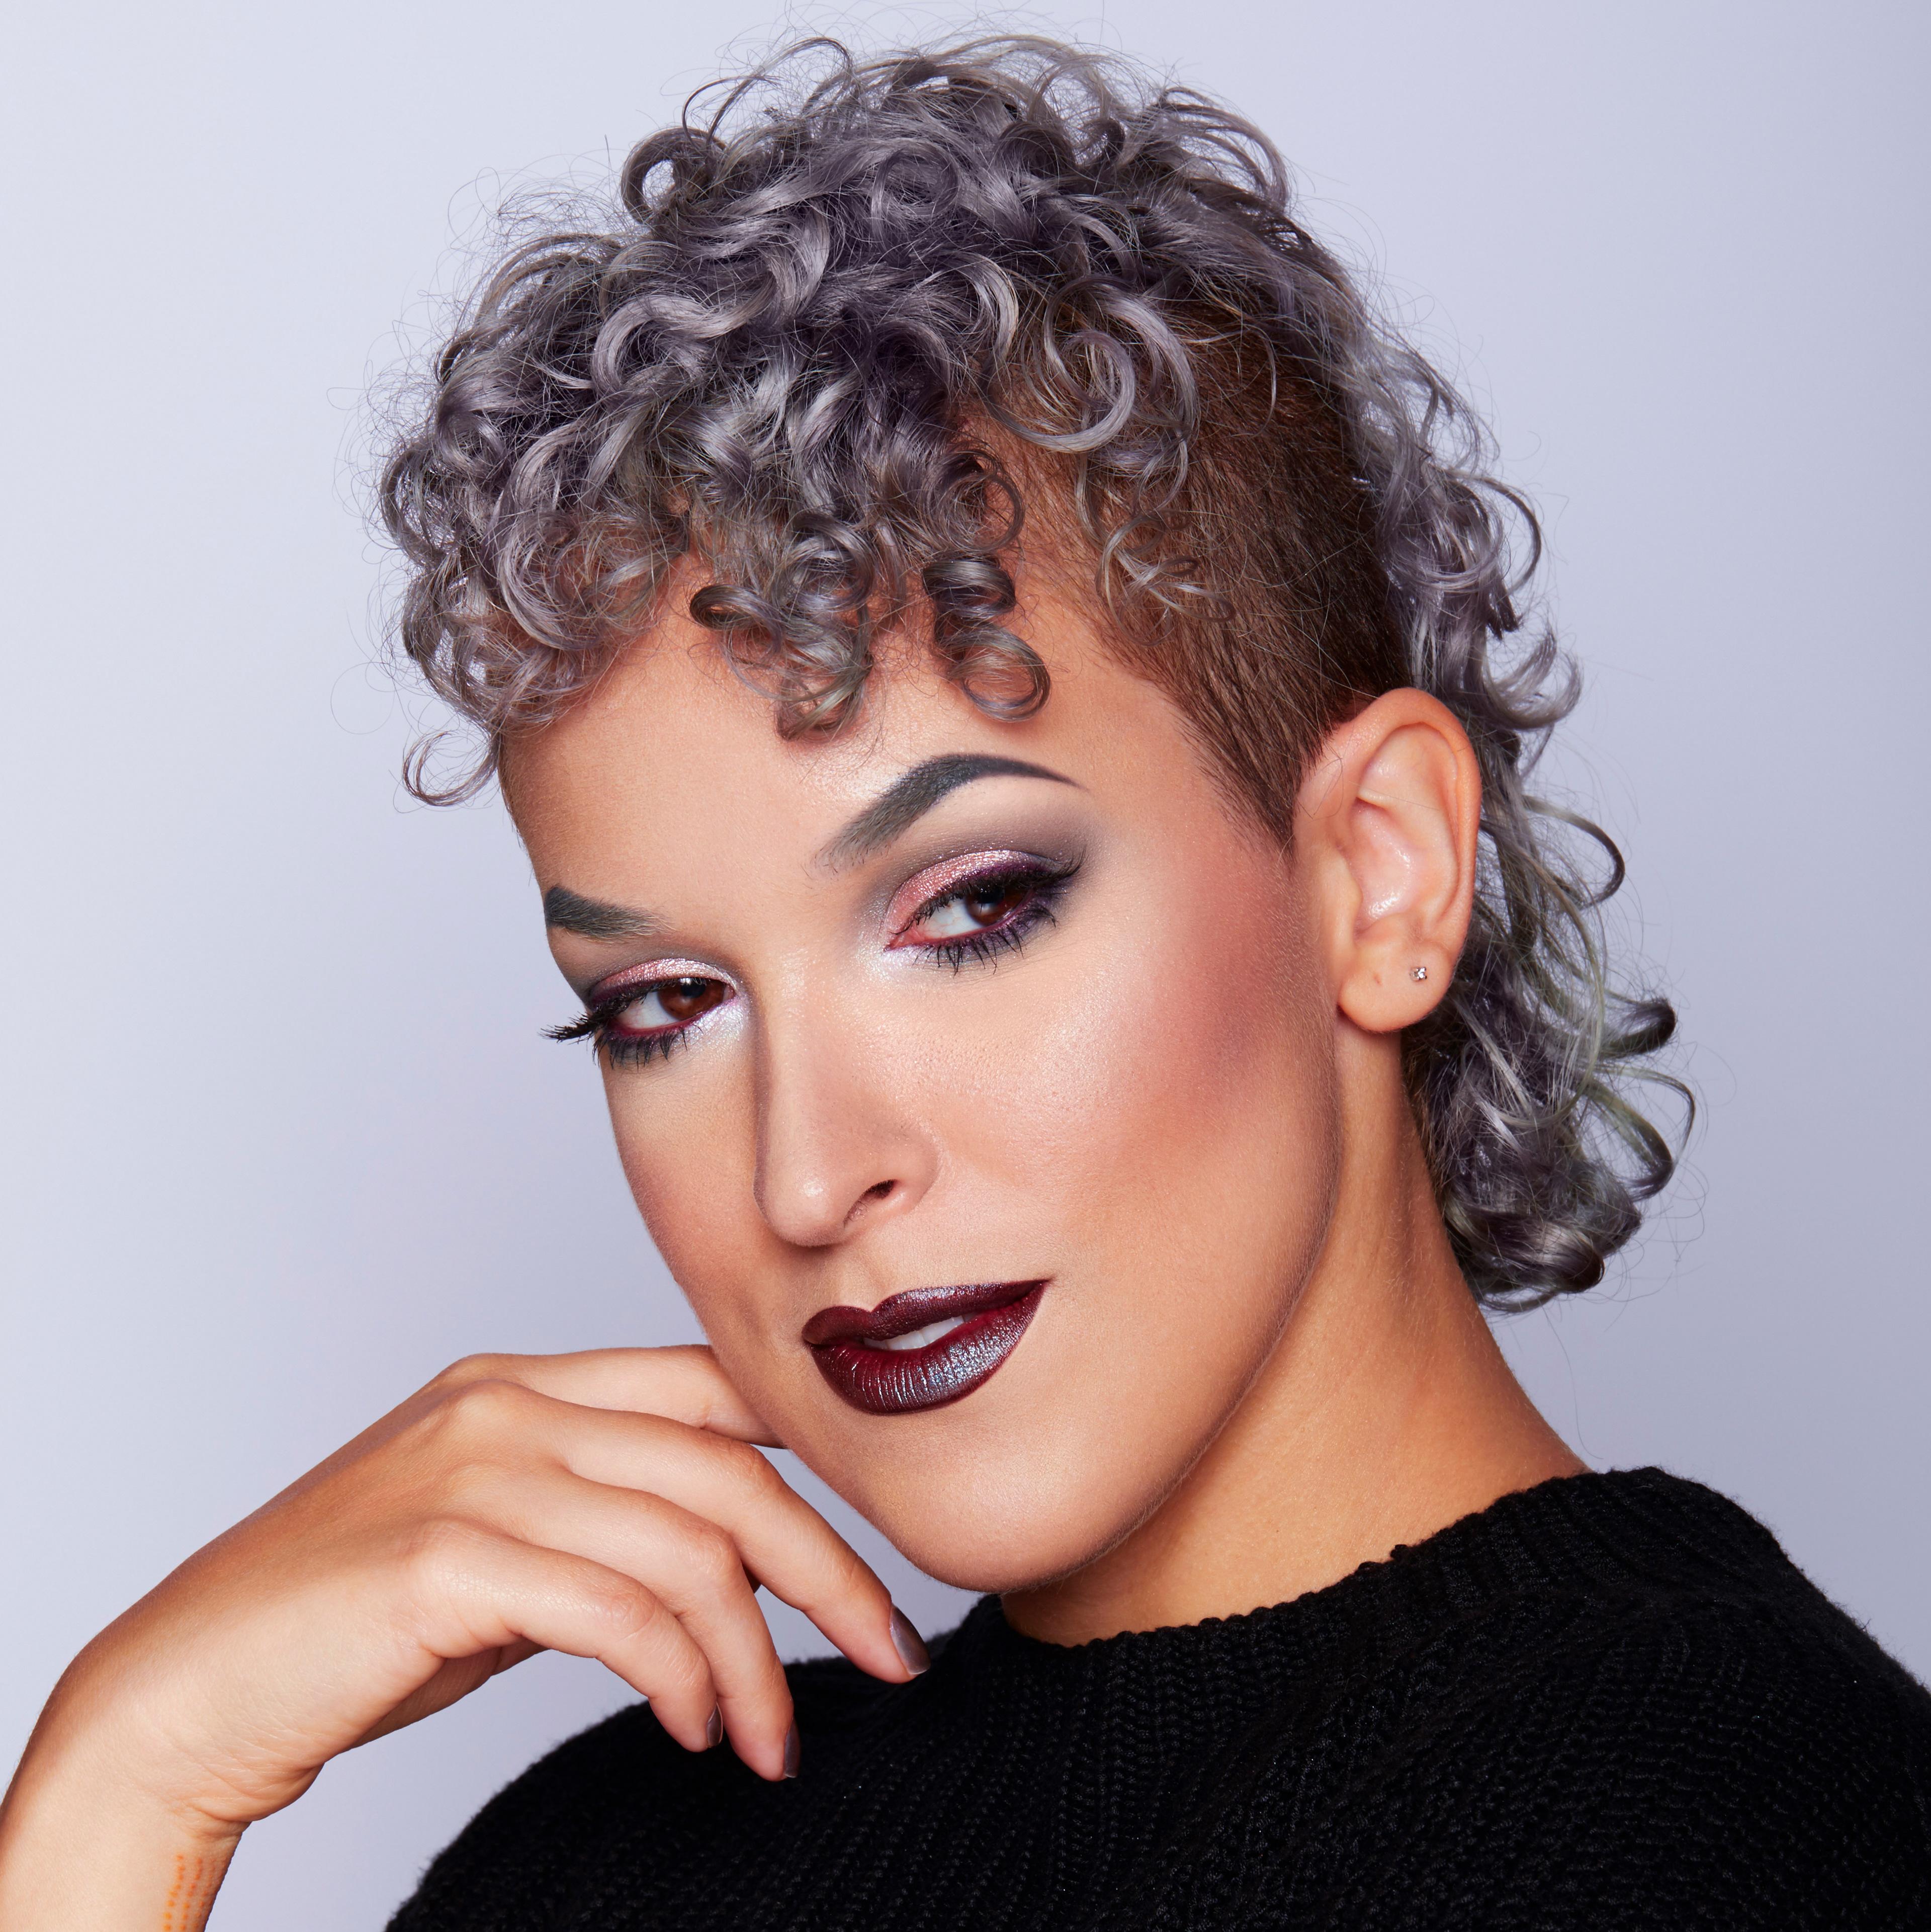 Fernanda Machado, aka Pompberry, is a Brazilian makeup artist living in Los Angeles. She started her career in 2010 working in the Brazilian fashion ...